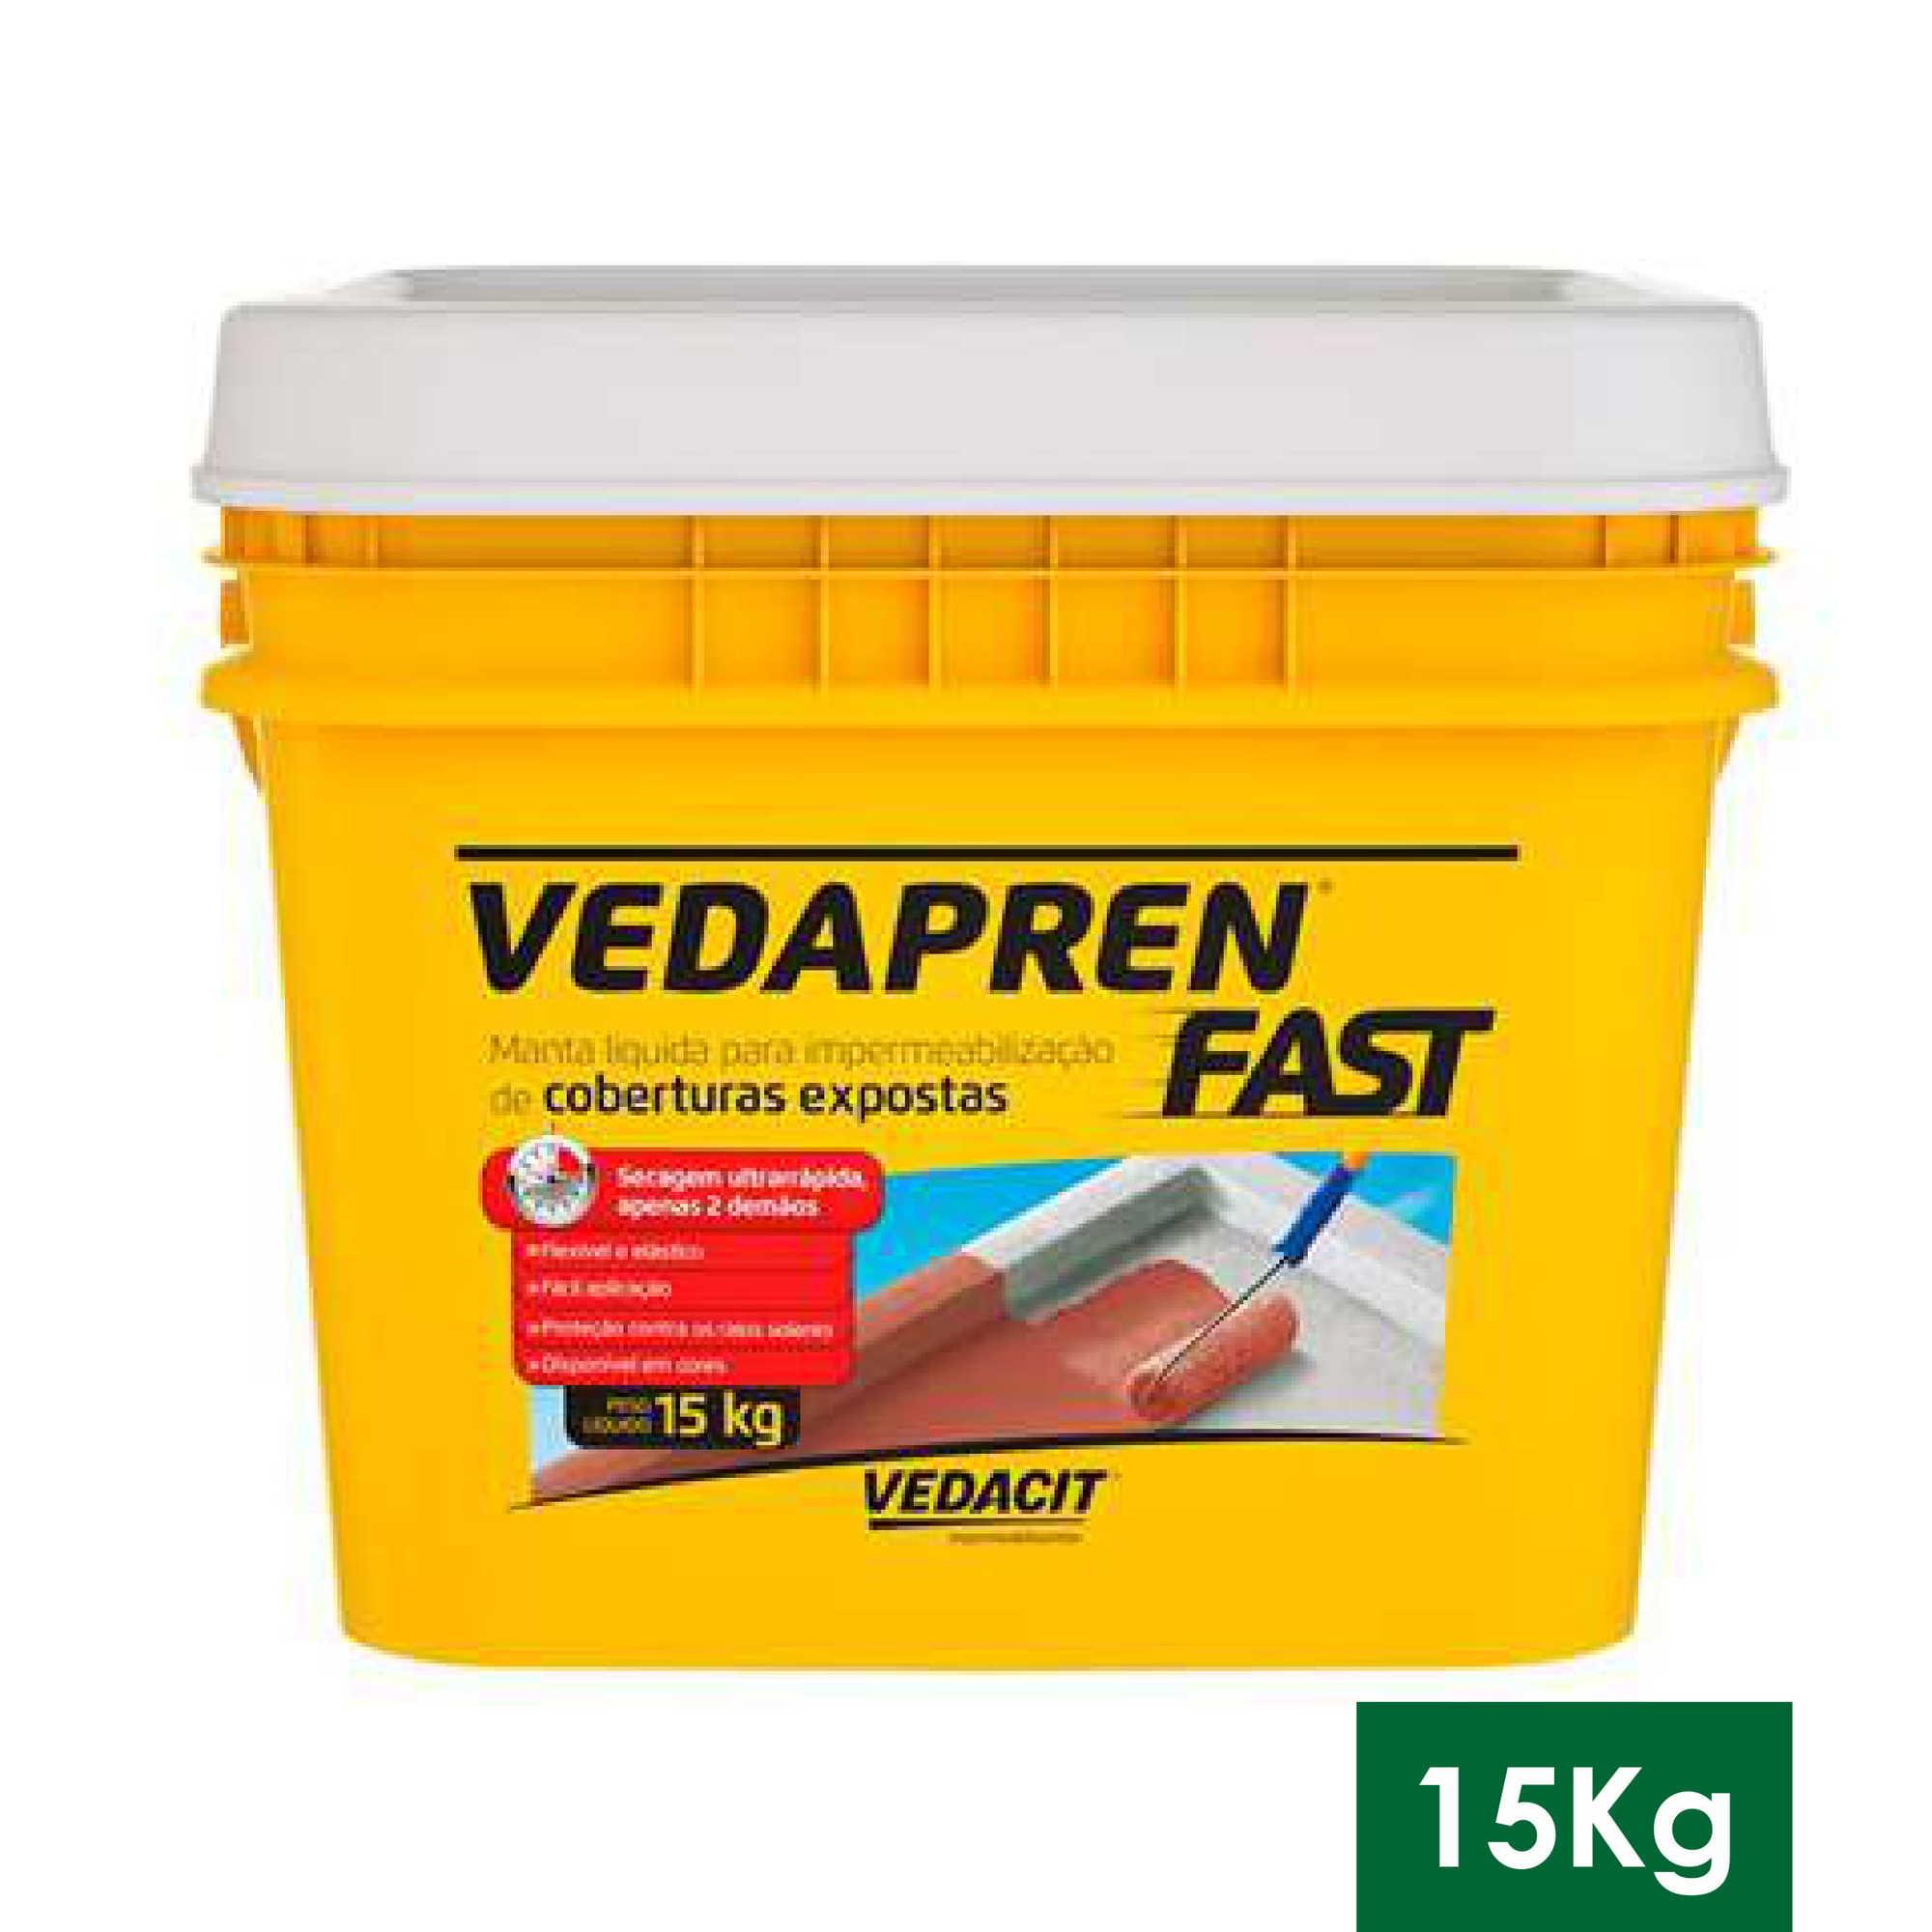 VEDAPREN FAST BRCO BD 15 KG